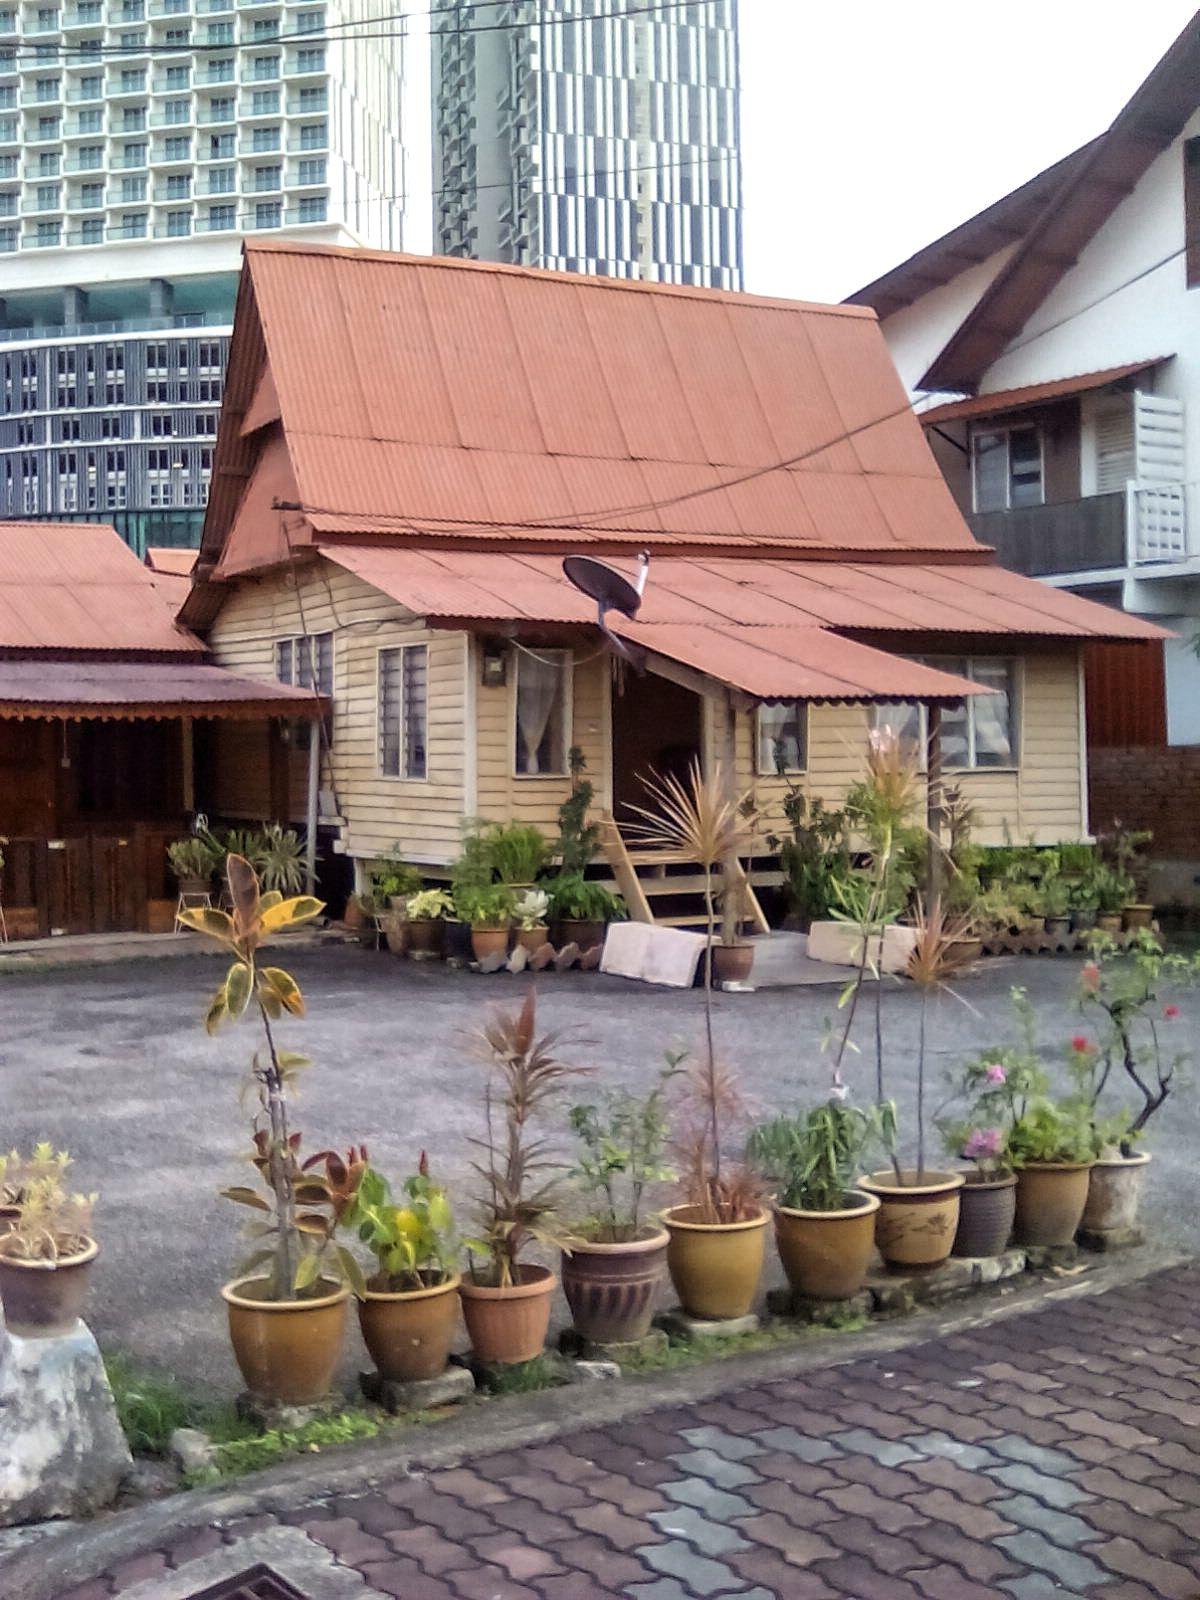 maison decouverte architecture malaie melaka malaisie